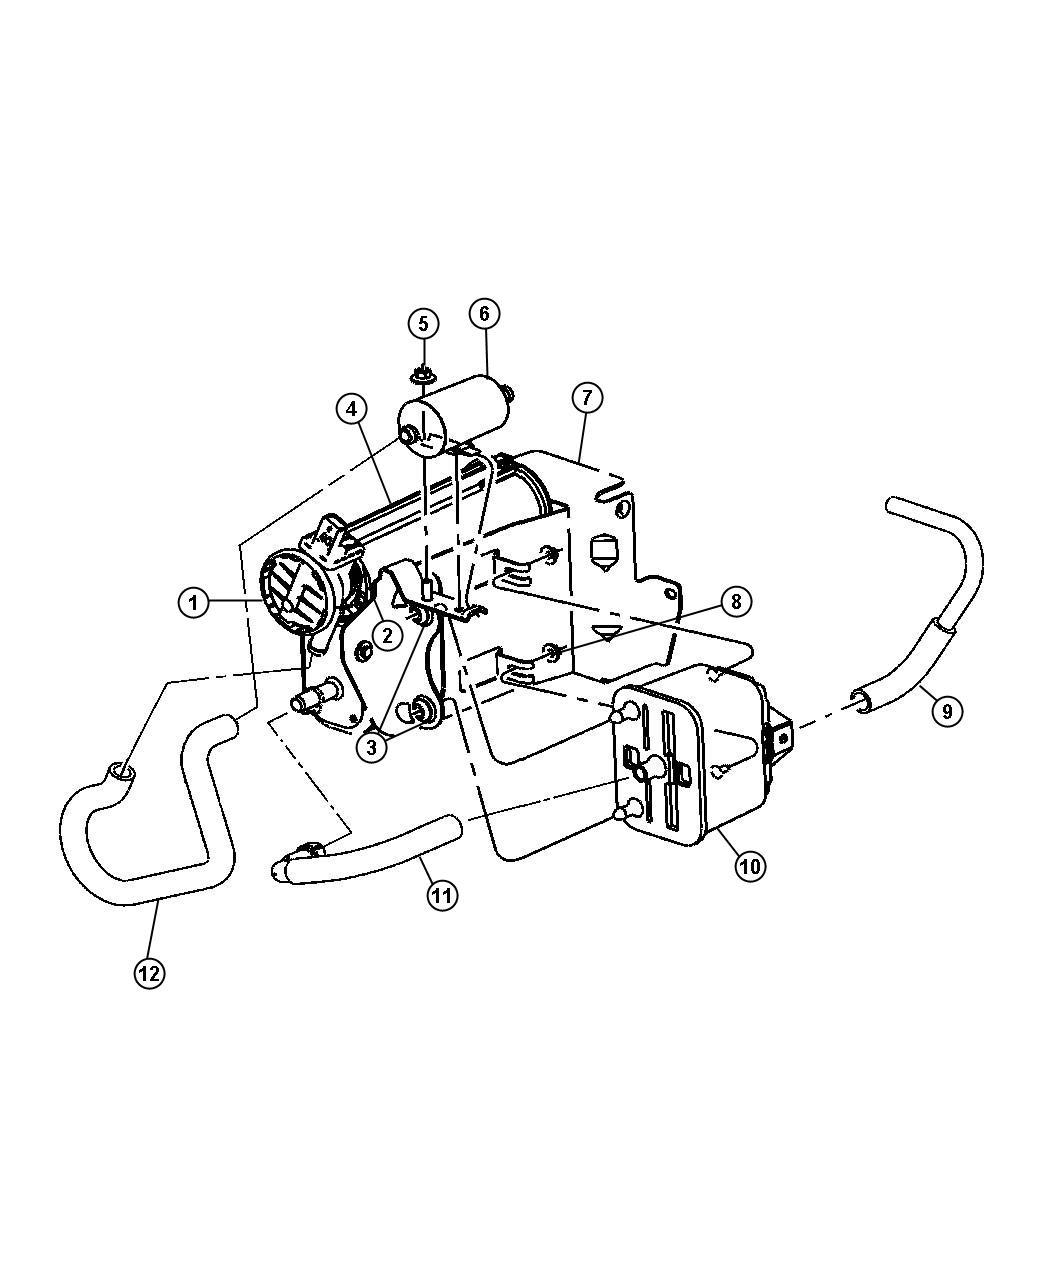 2012 Dodge Ram 2500 Filter. Leak detection pump